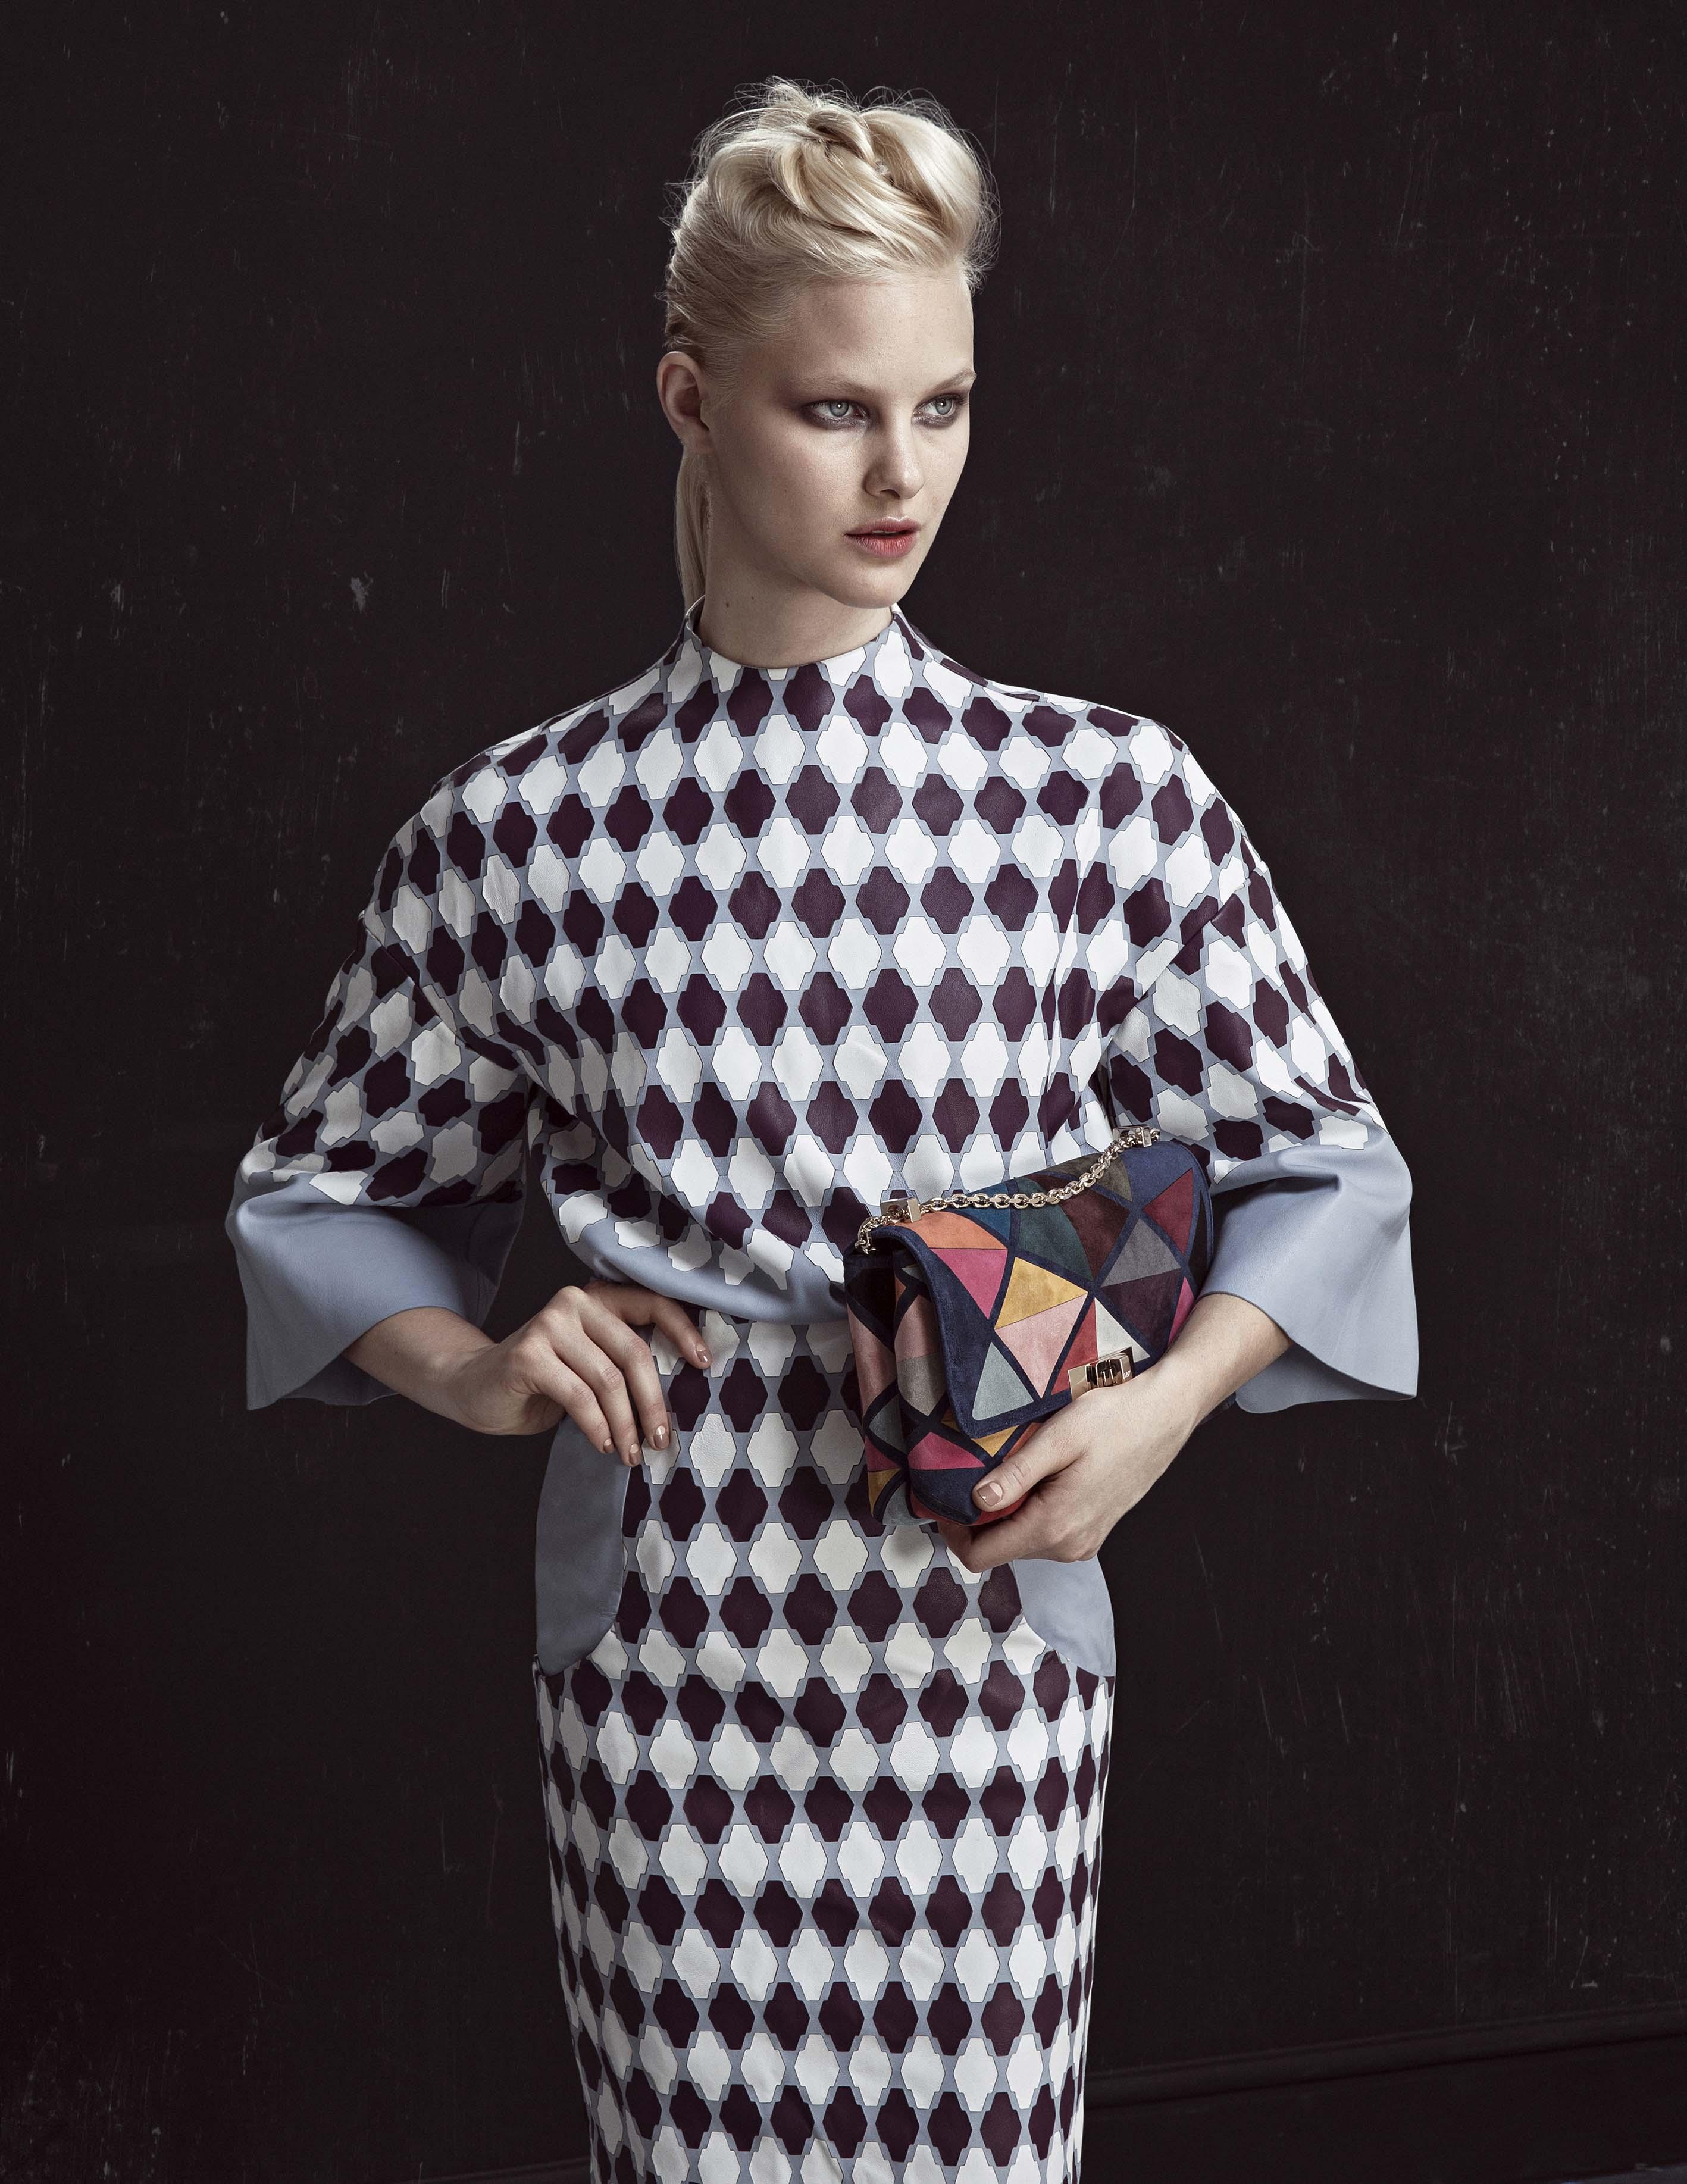 Stylist: The Interpreters of Fashion: m, Anna Anna foster fashion stylist